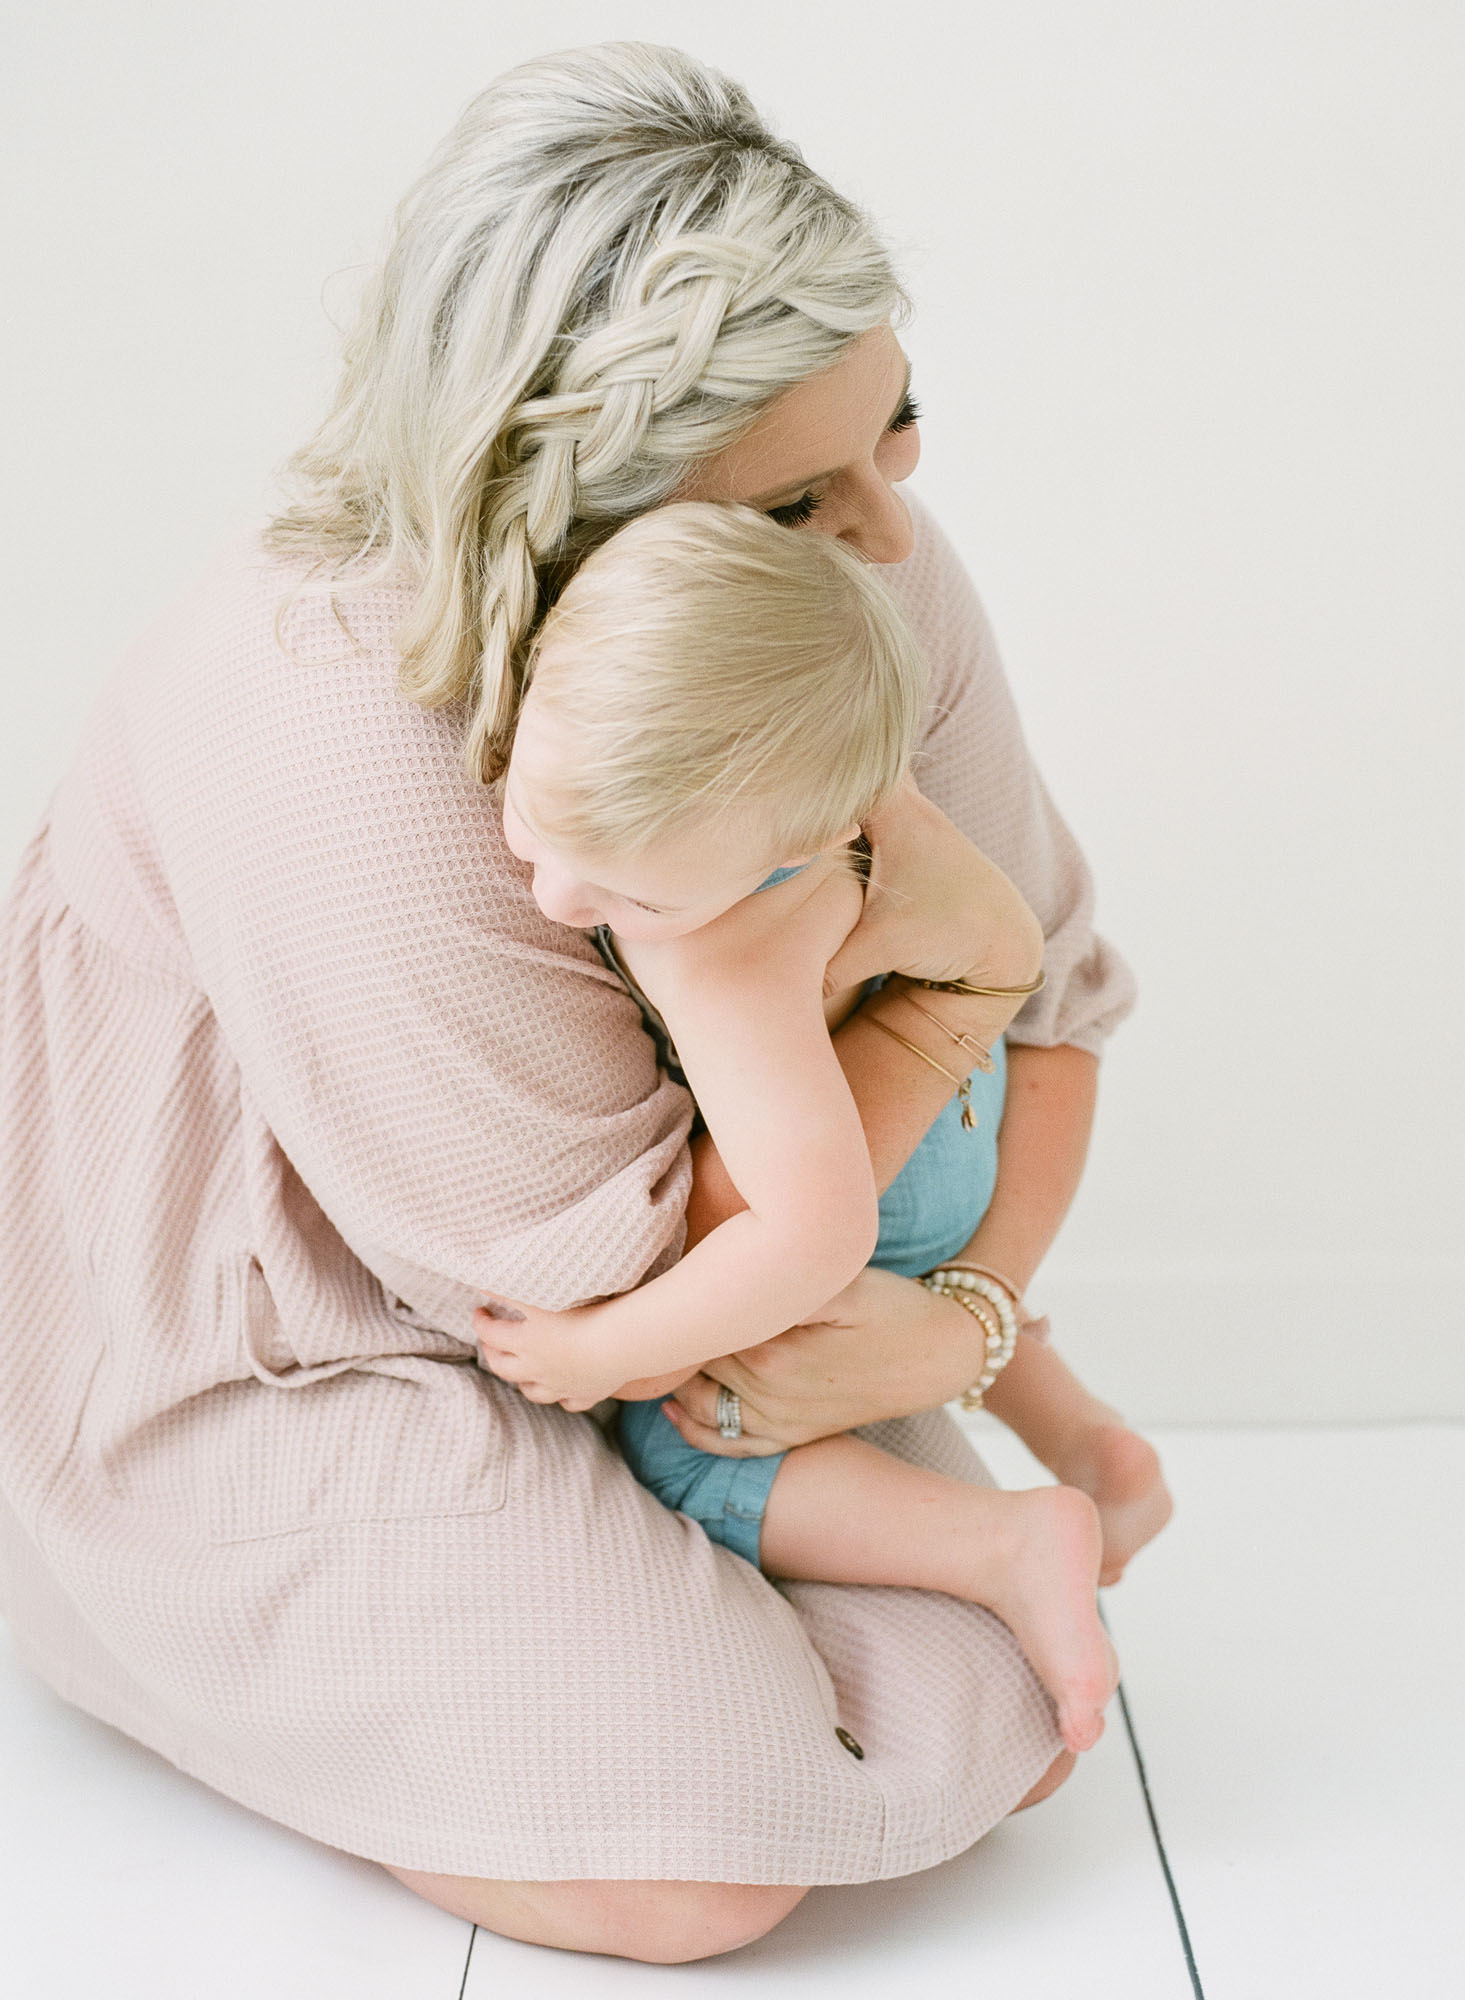 wake-forest-family-photographer-studio-session-motherhood-003